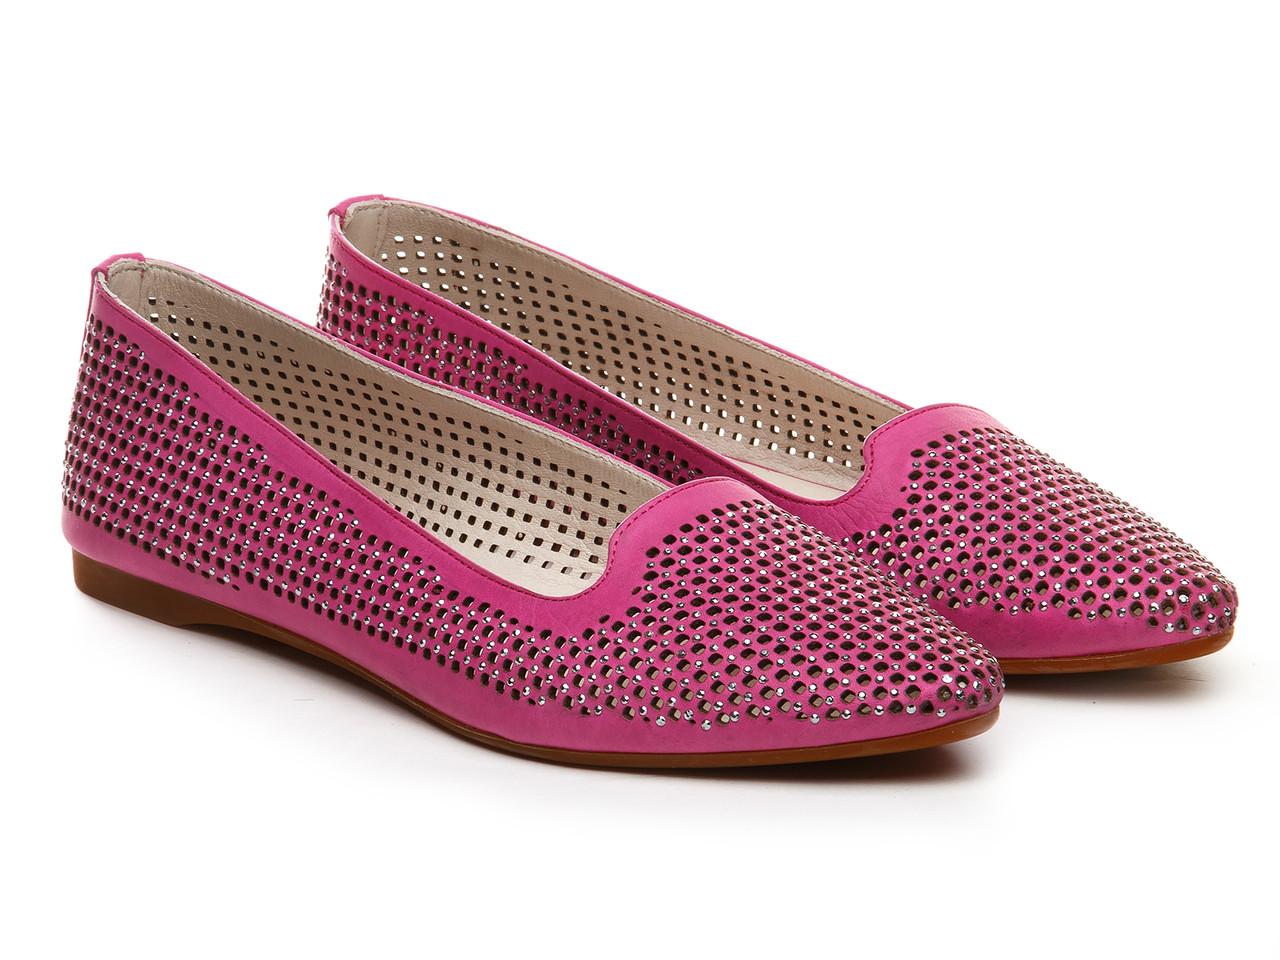 Балетки Etor 4749-1383-2 розовые, фото 1